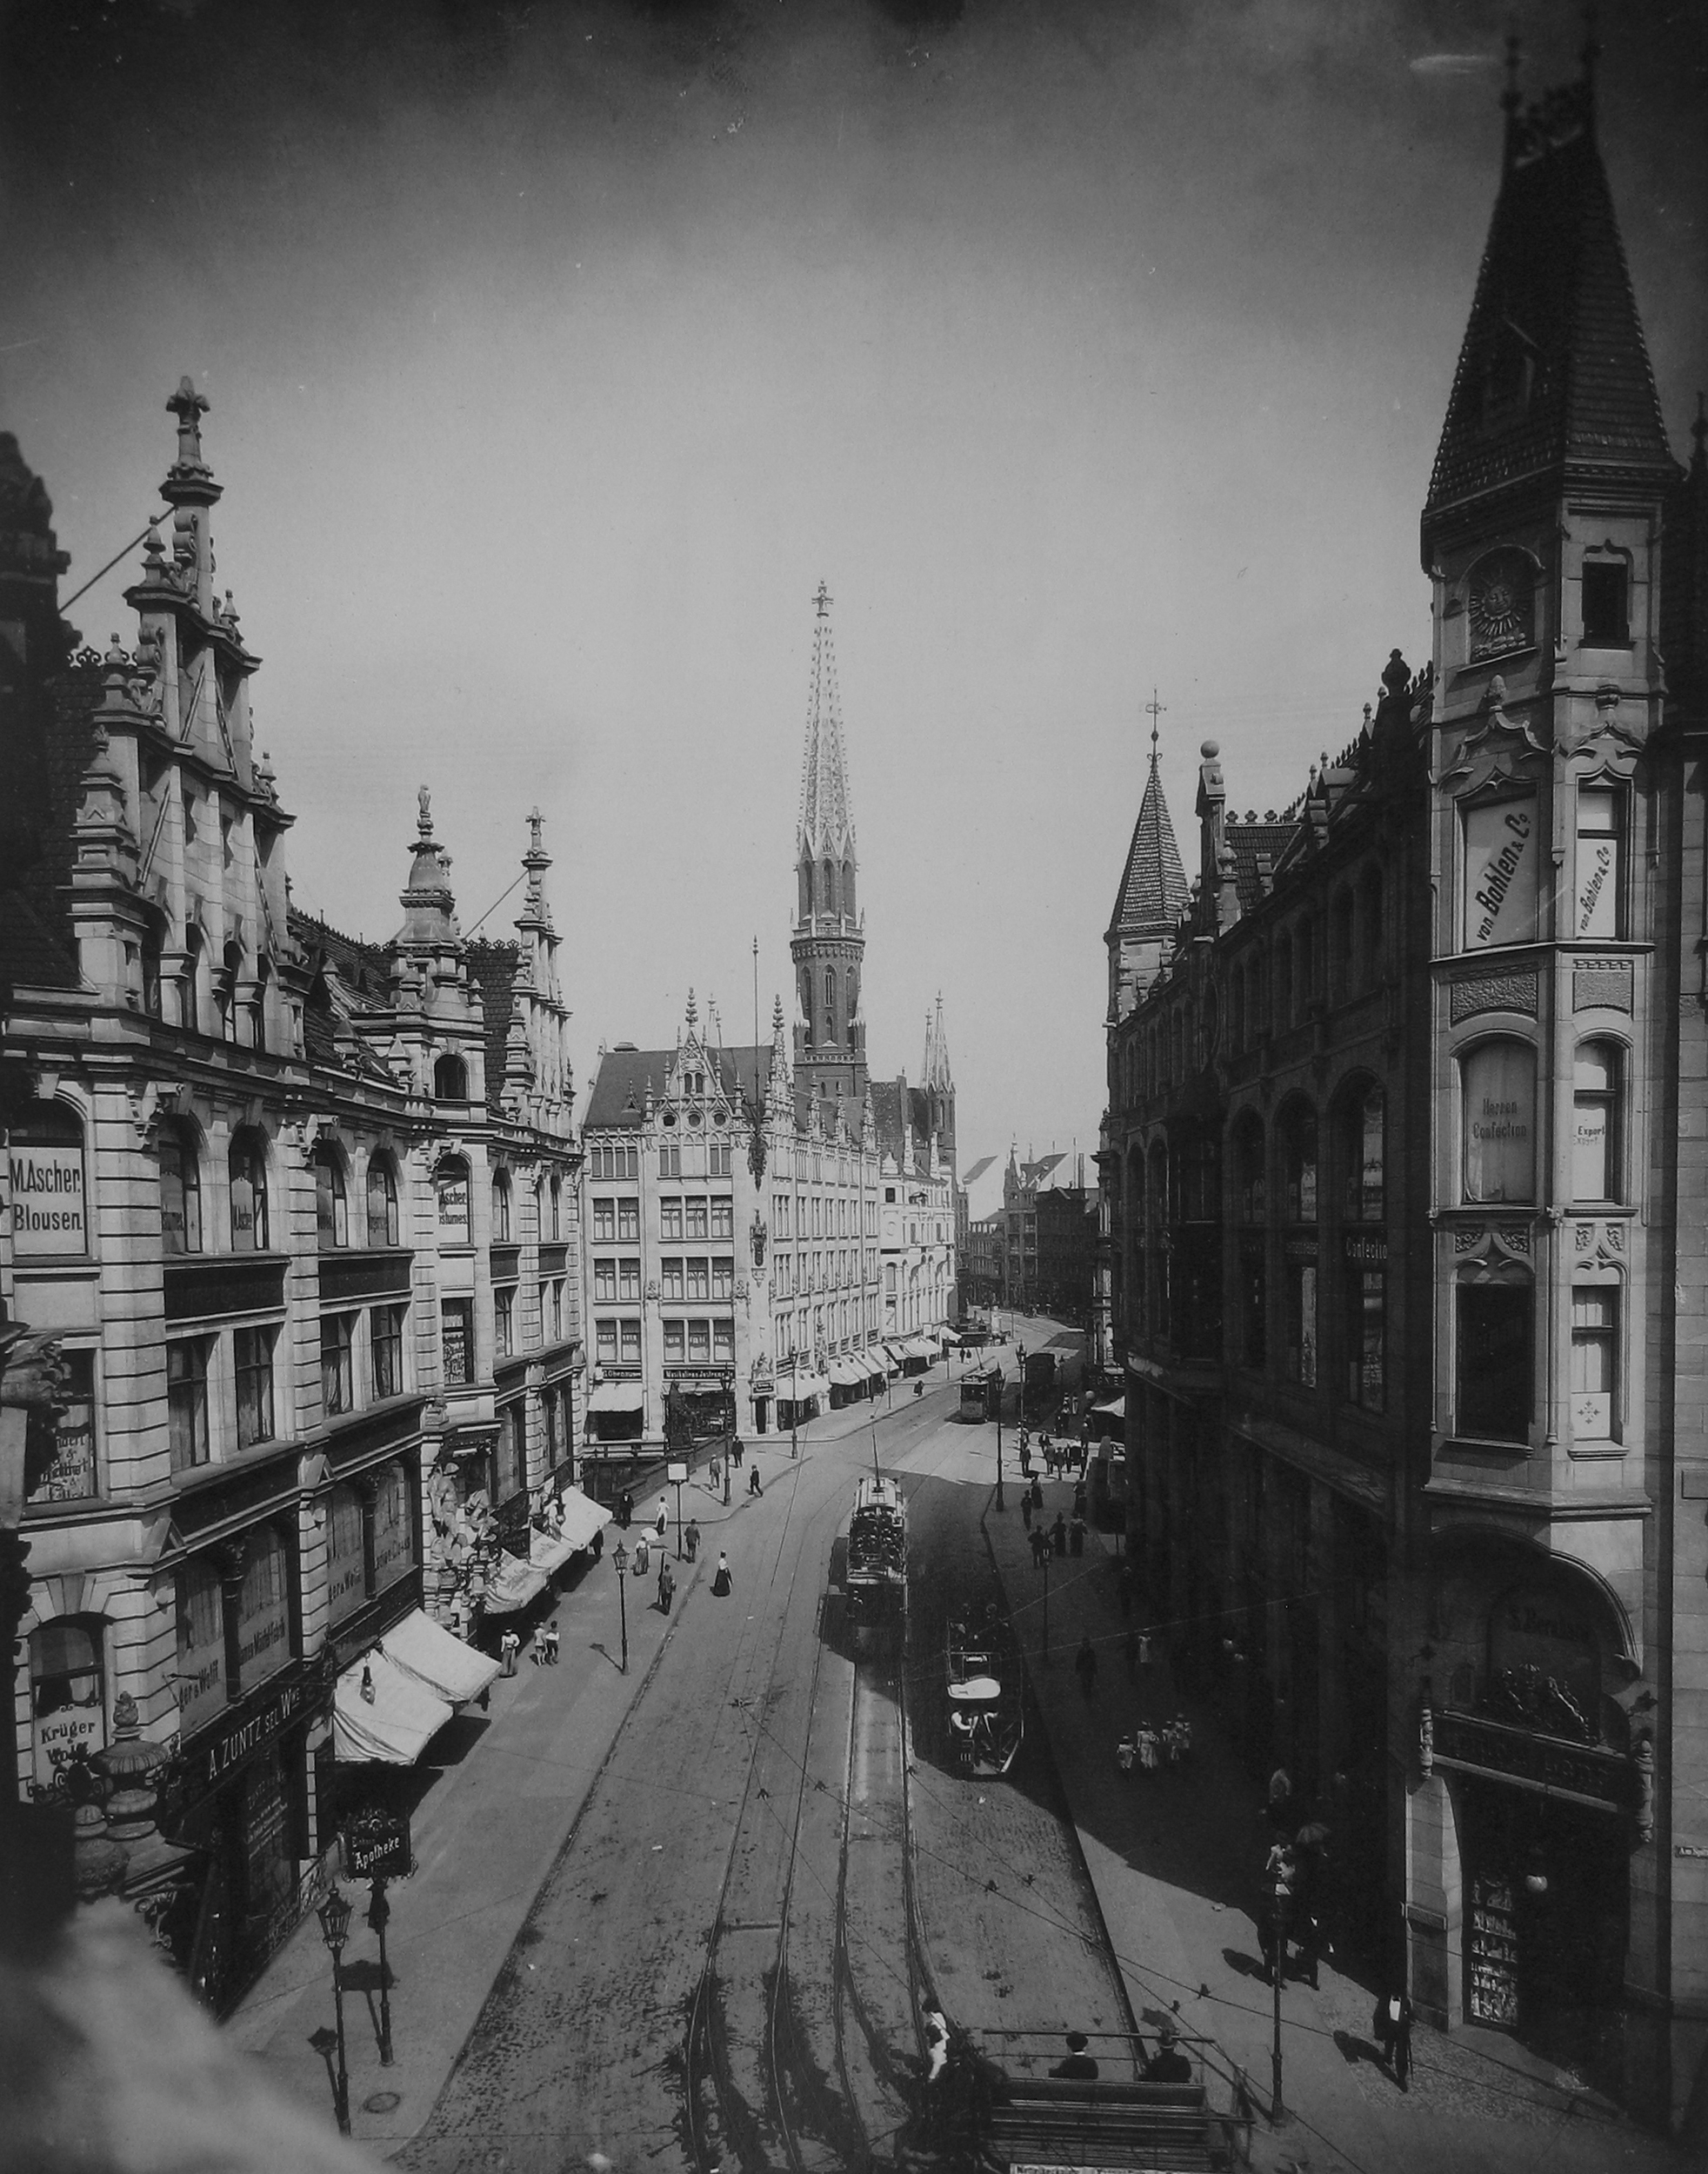 Gertraudenstr Titzenthaler 1901.jpg